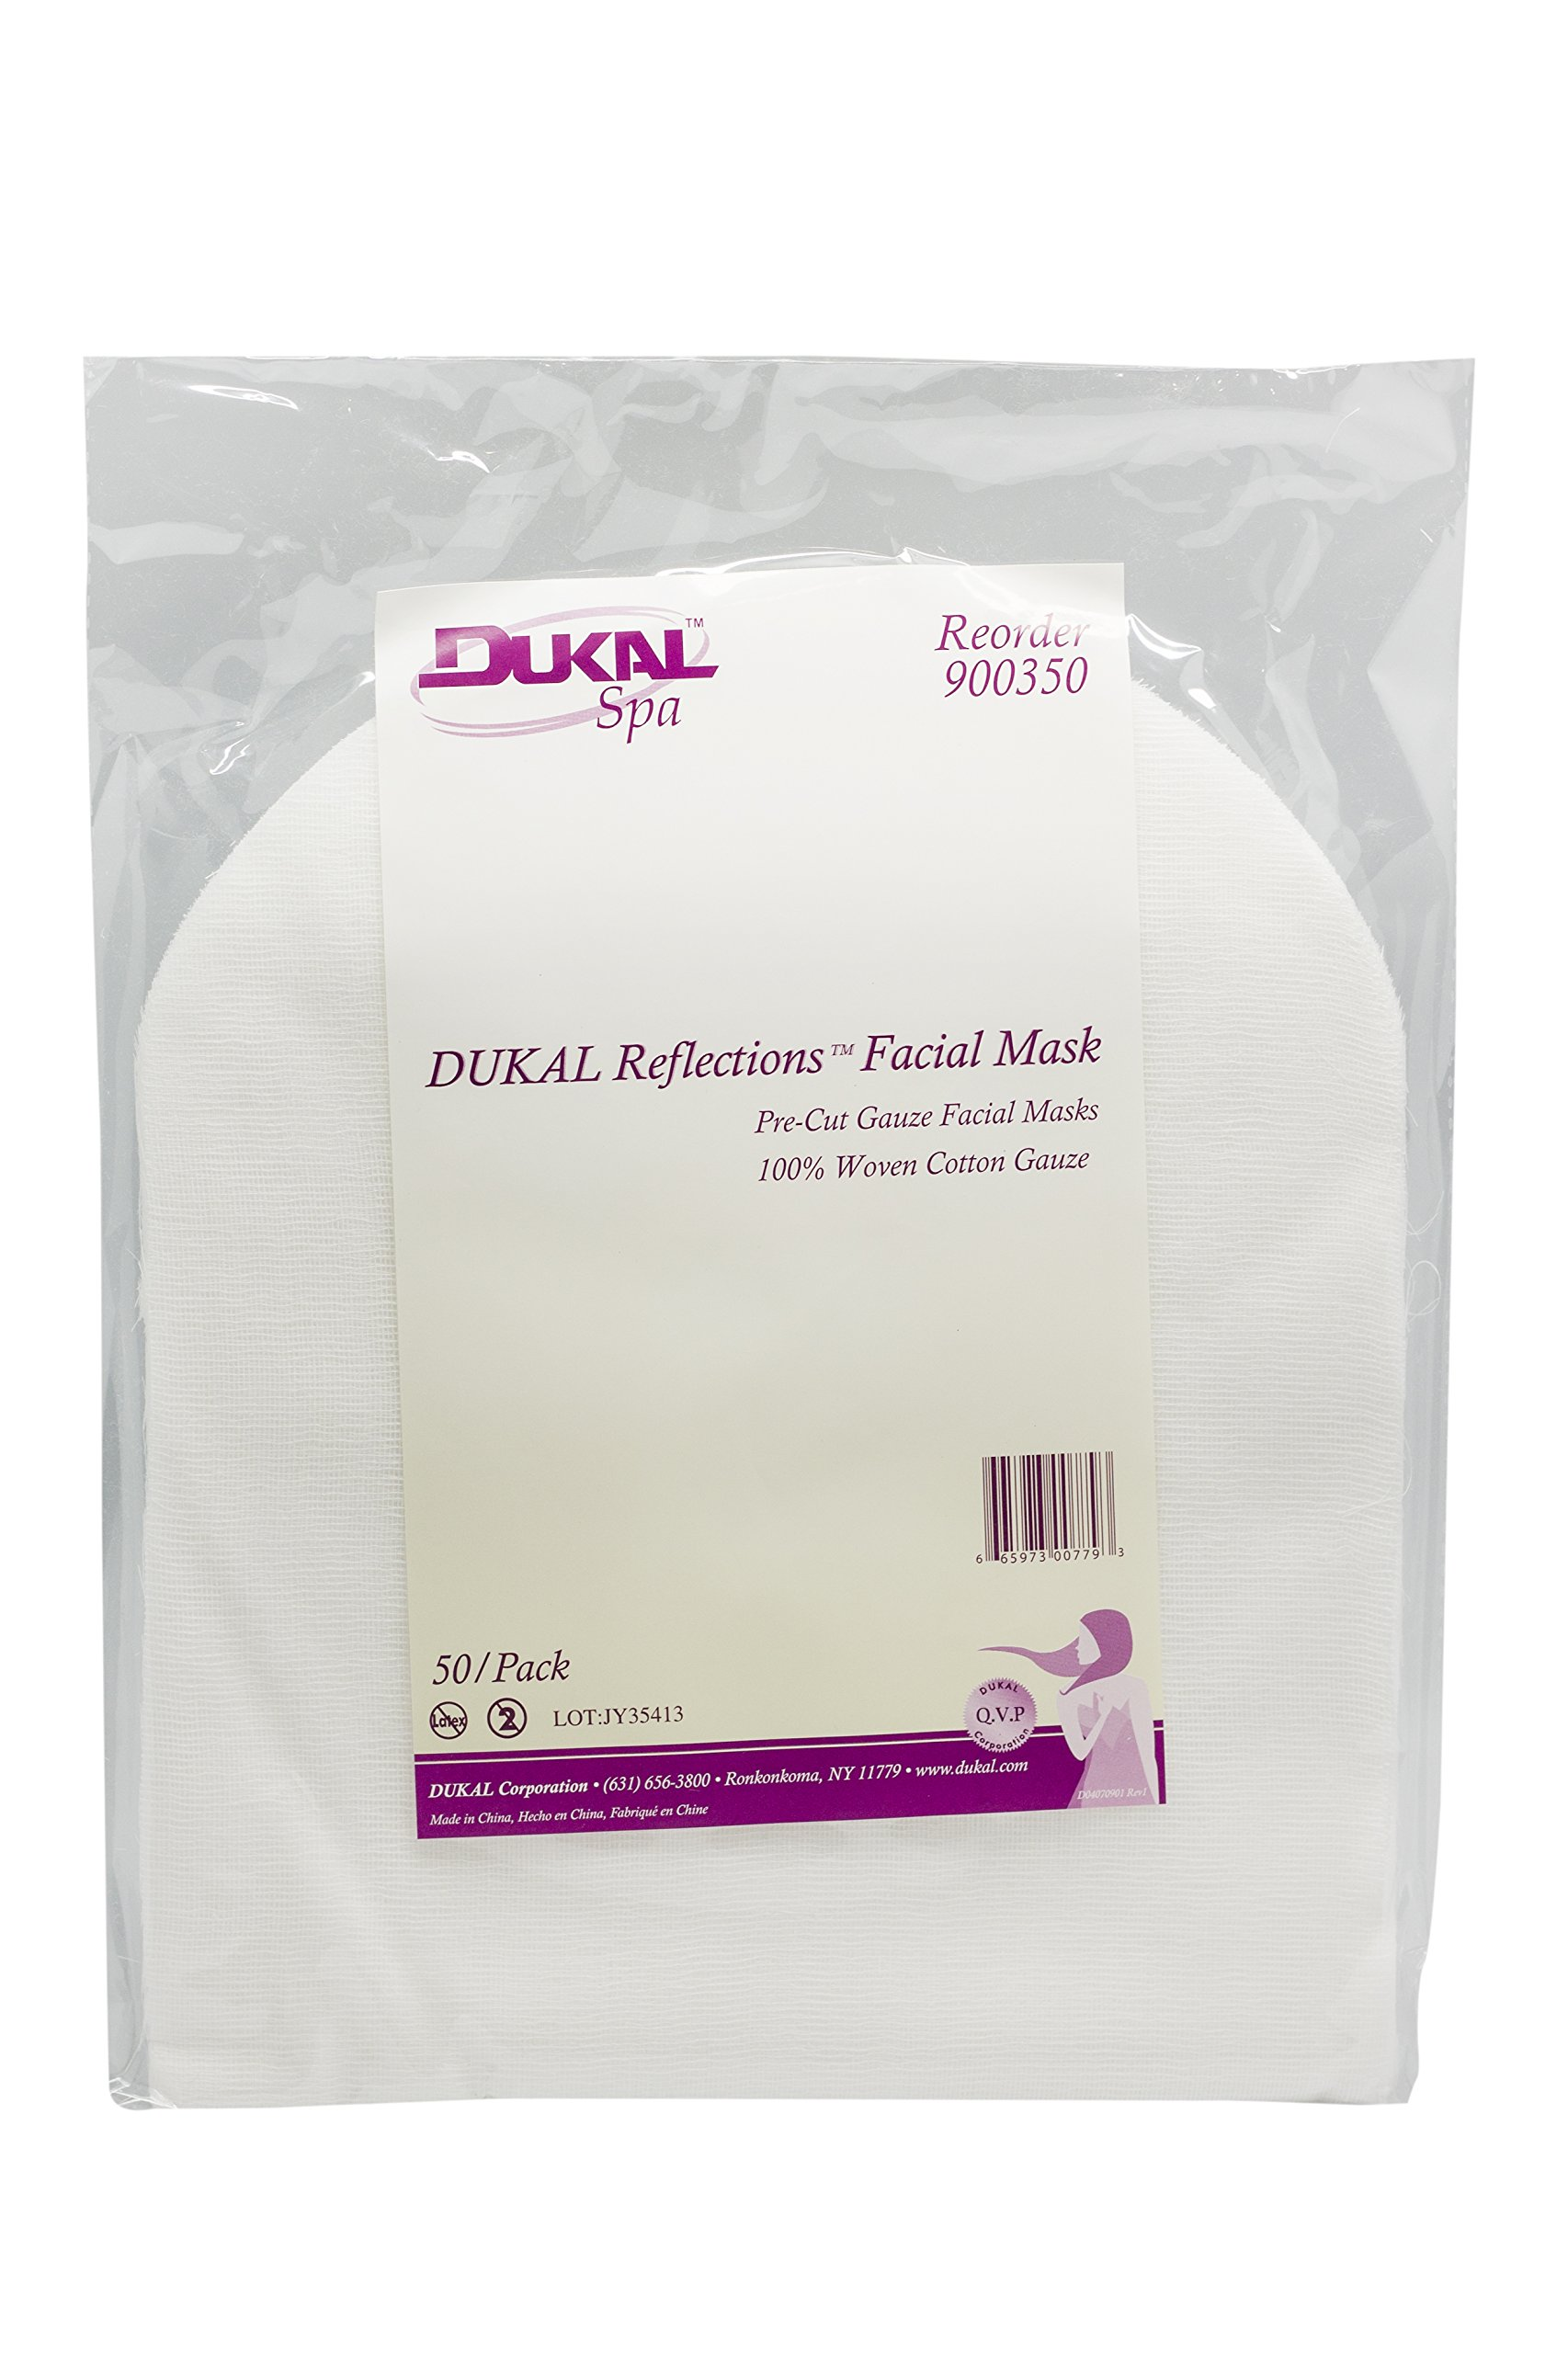 Dukal 900305 Facial Mask, Non-Sterile, Pre-cut (Pack of 400)